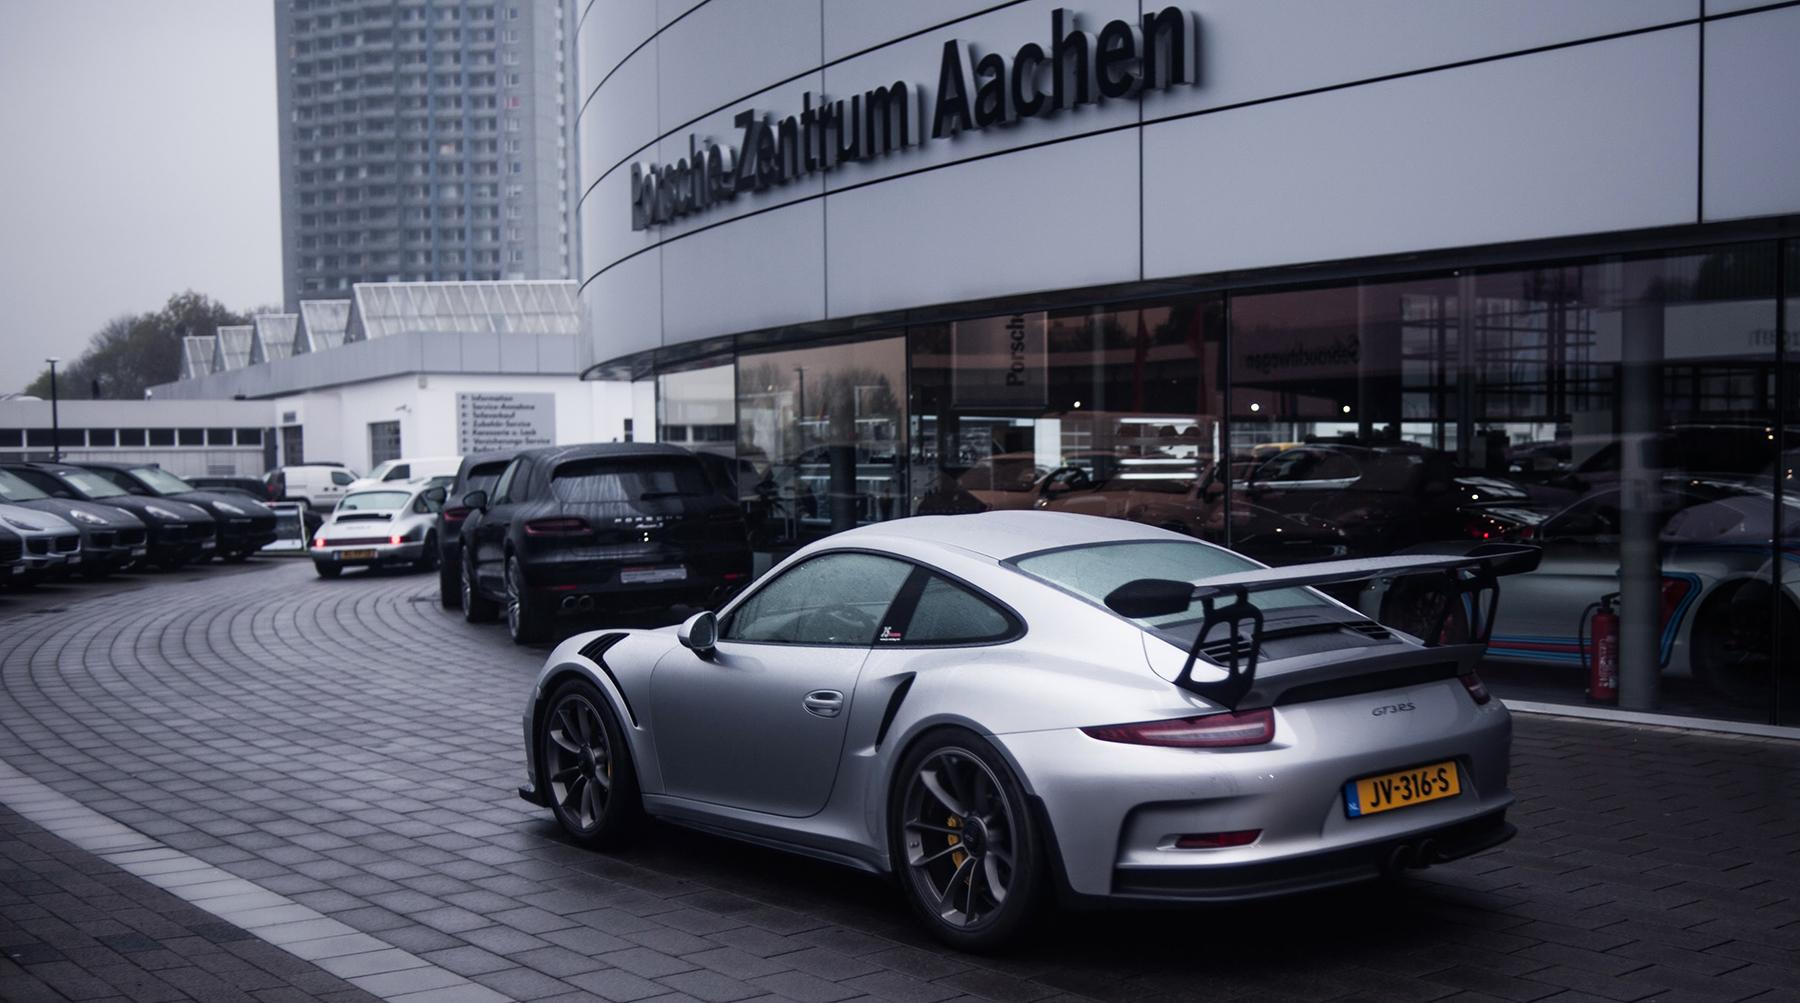 Roadpursuit Porsche centrum Aachen GT3